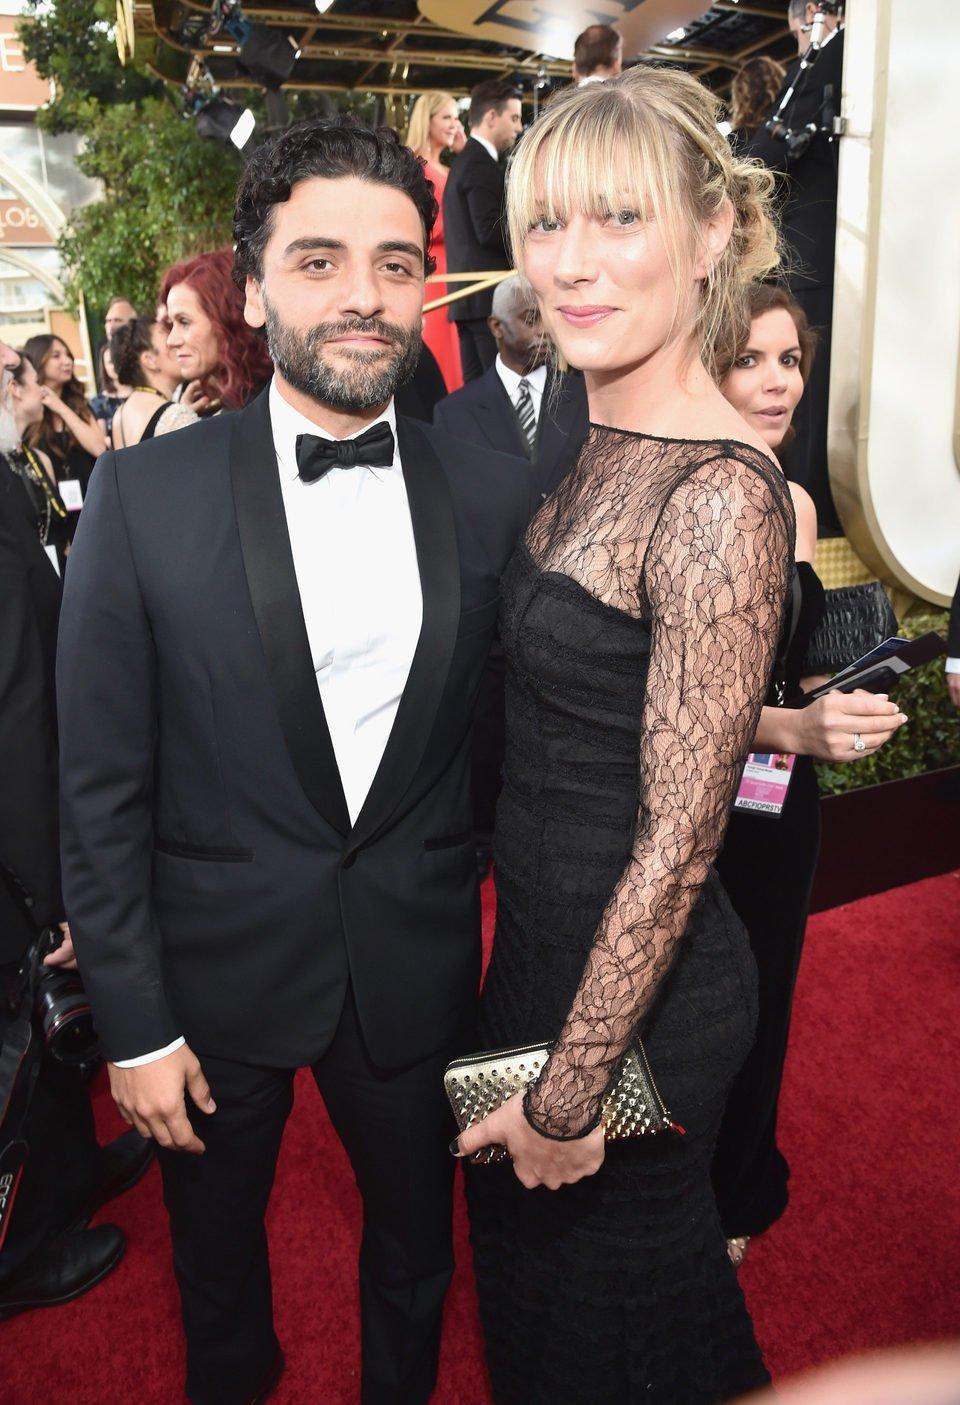 Oscar Isaac and Maria Miranda at the 2016 Golden Globes red carpet